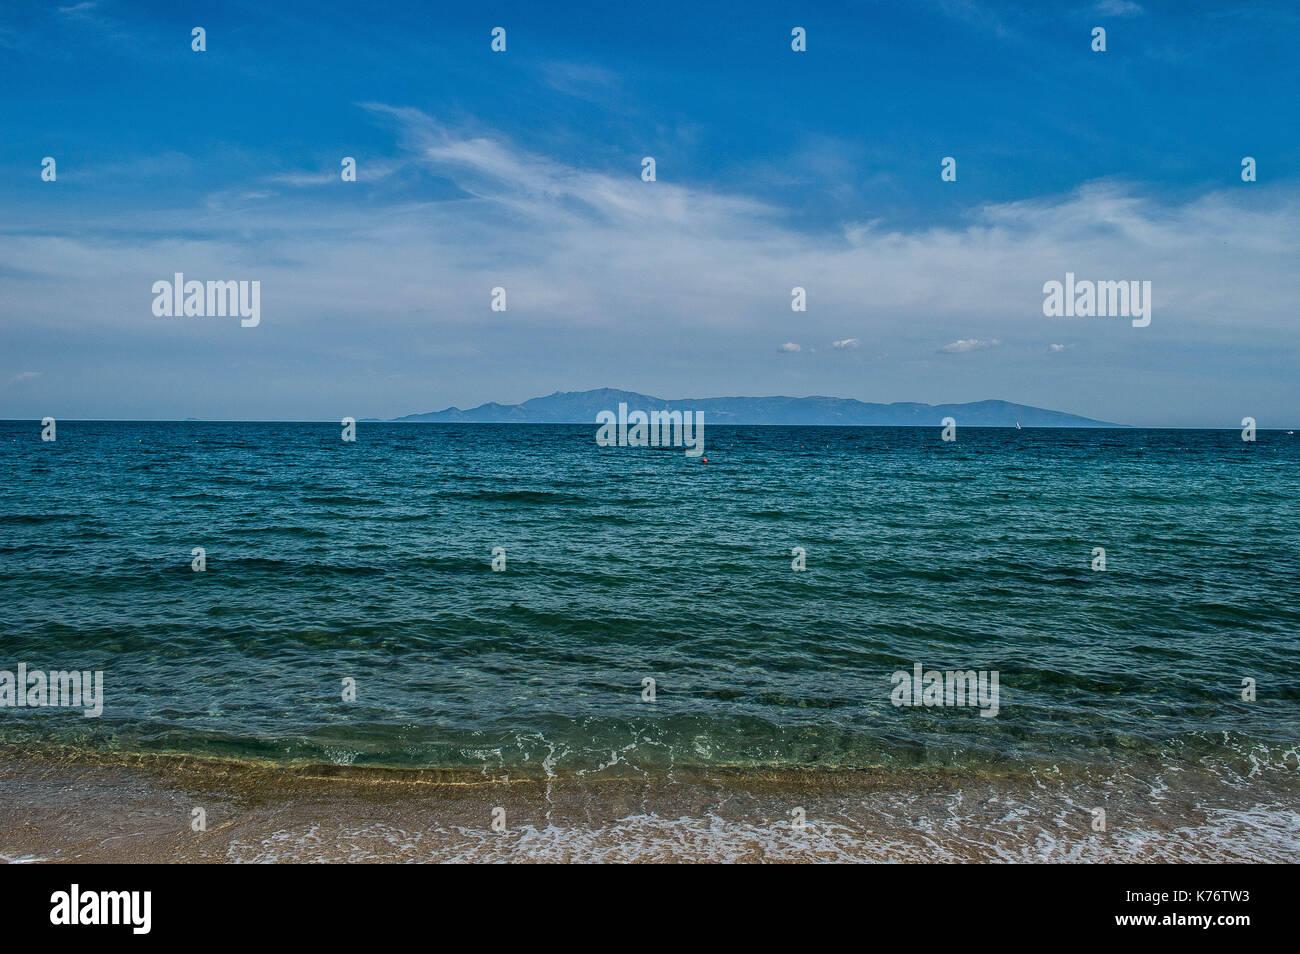 Sea, Greece Stock Photo